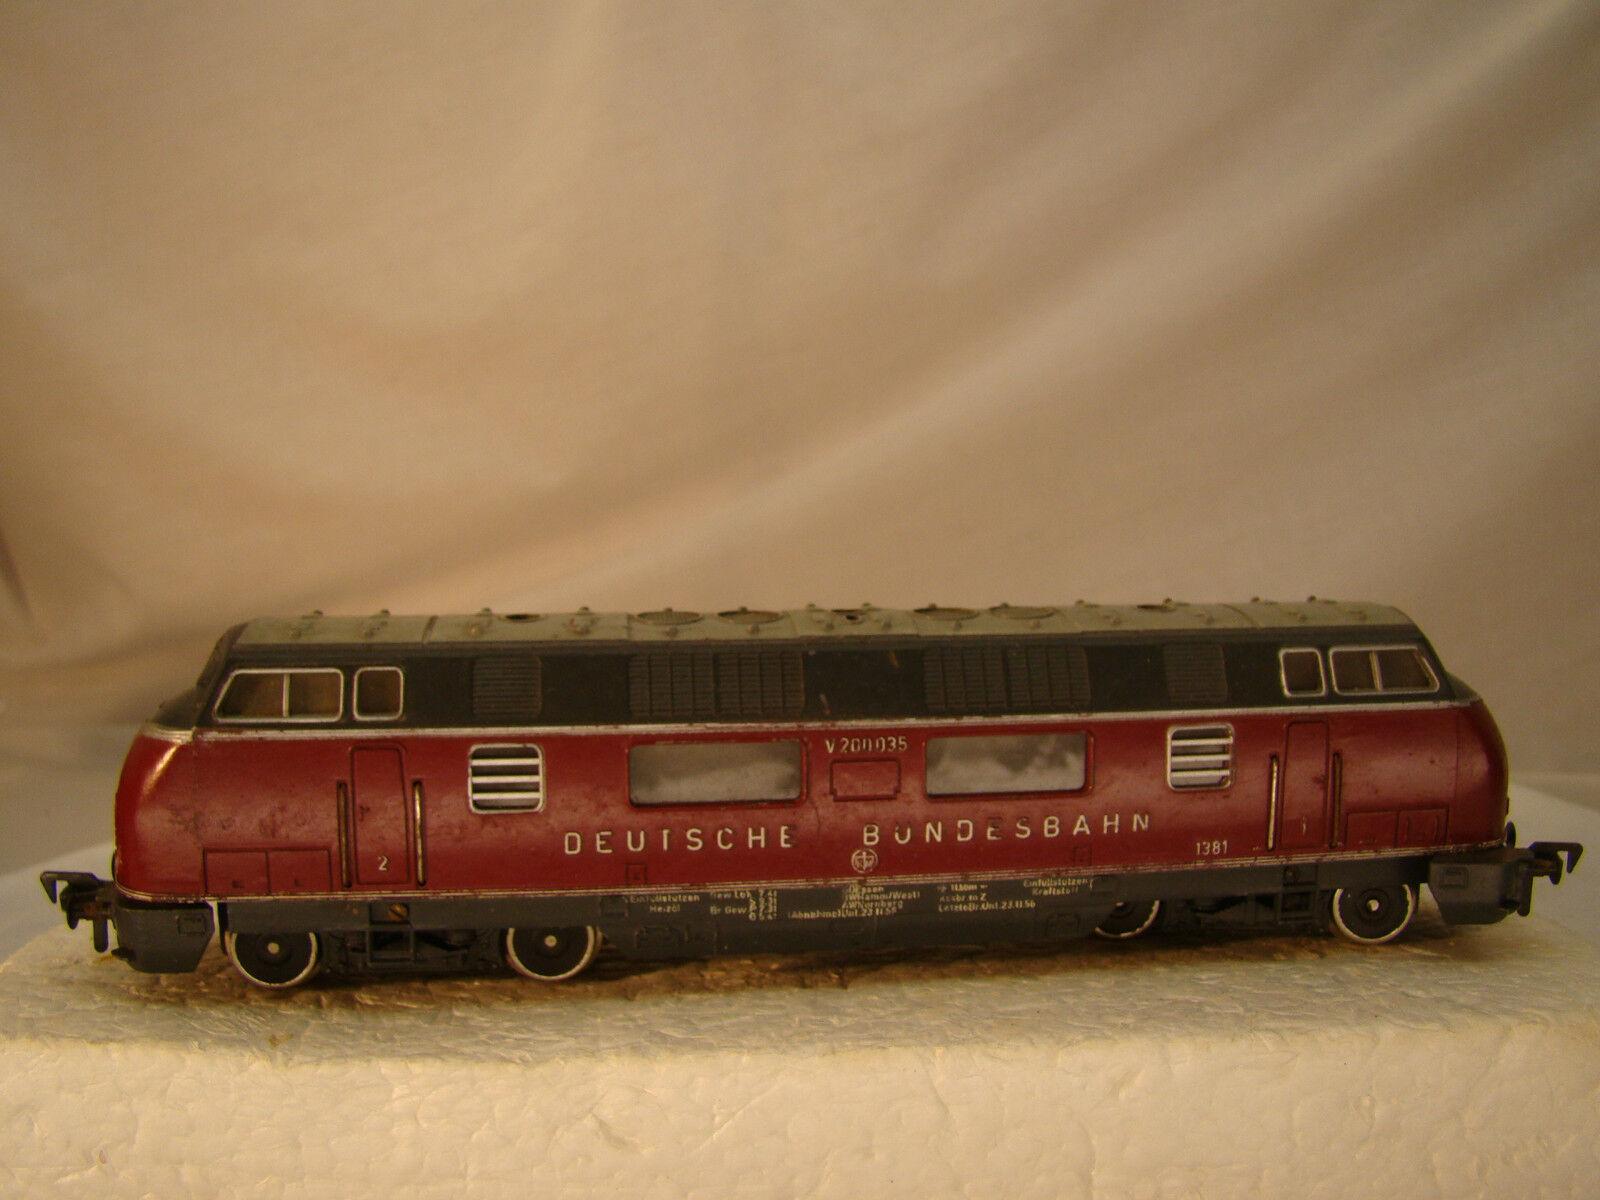 Legendary TEE Diesel Engine - trans European Express - smooth, powerful runner